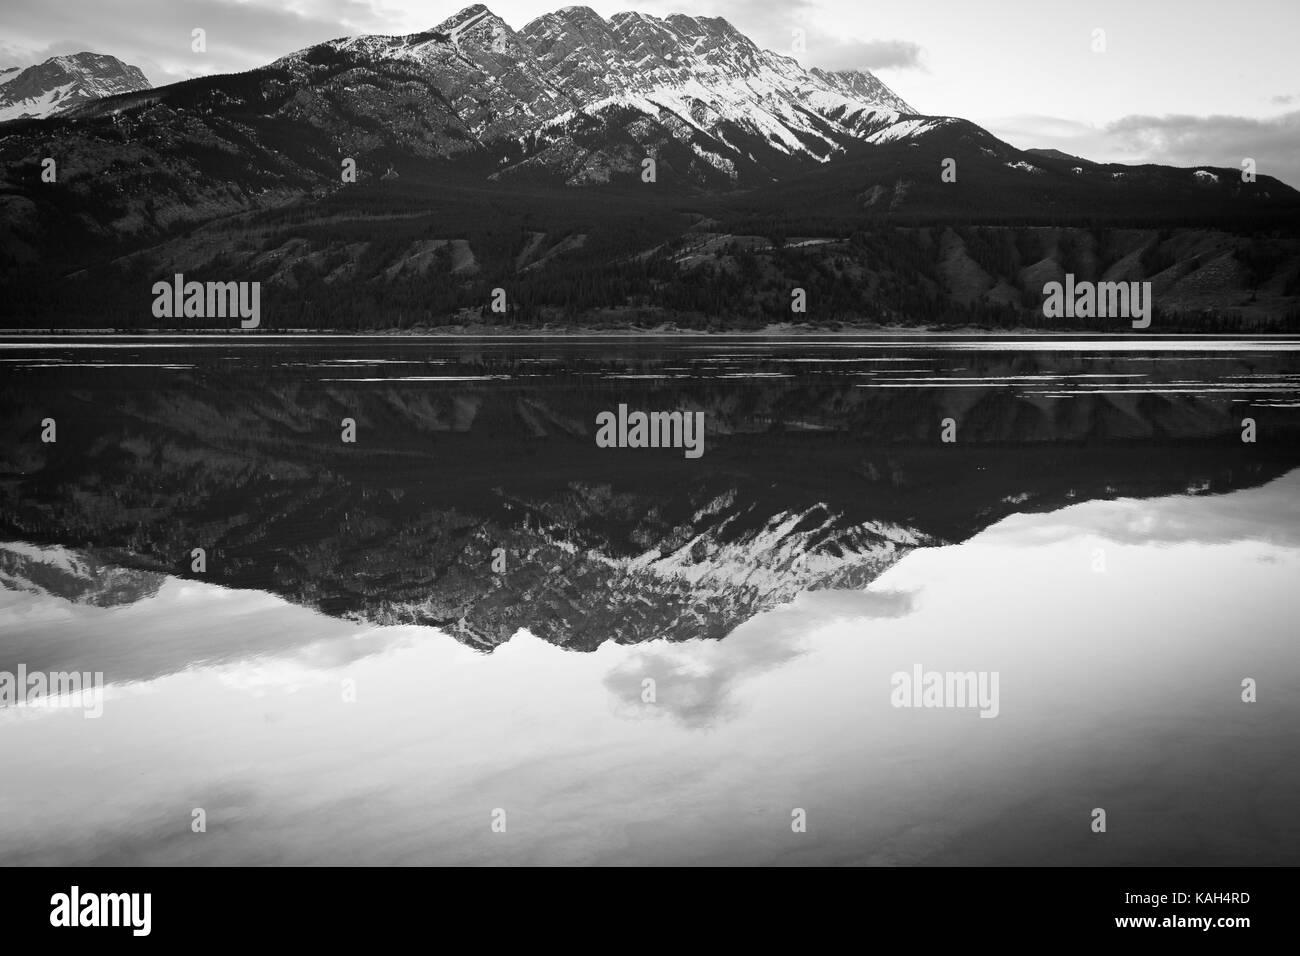 Medicine Lake Alberta Canada - Stock Image